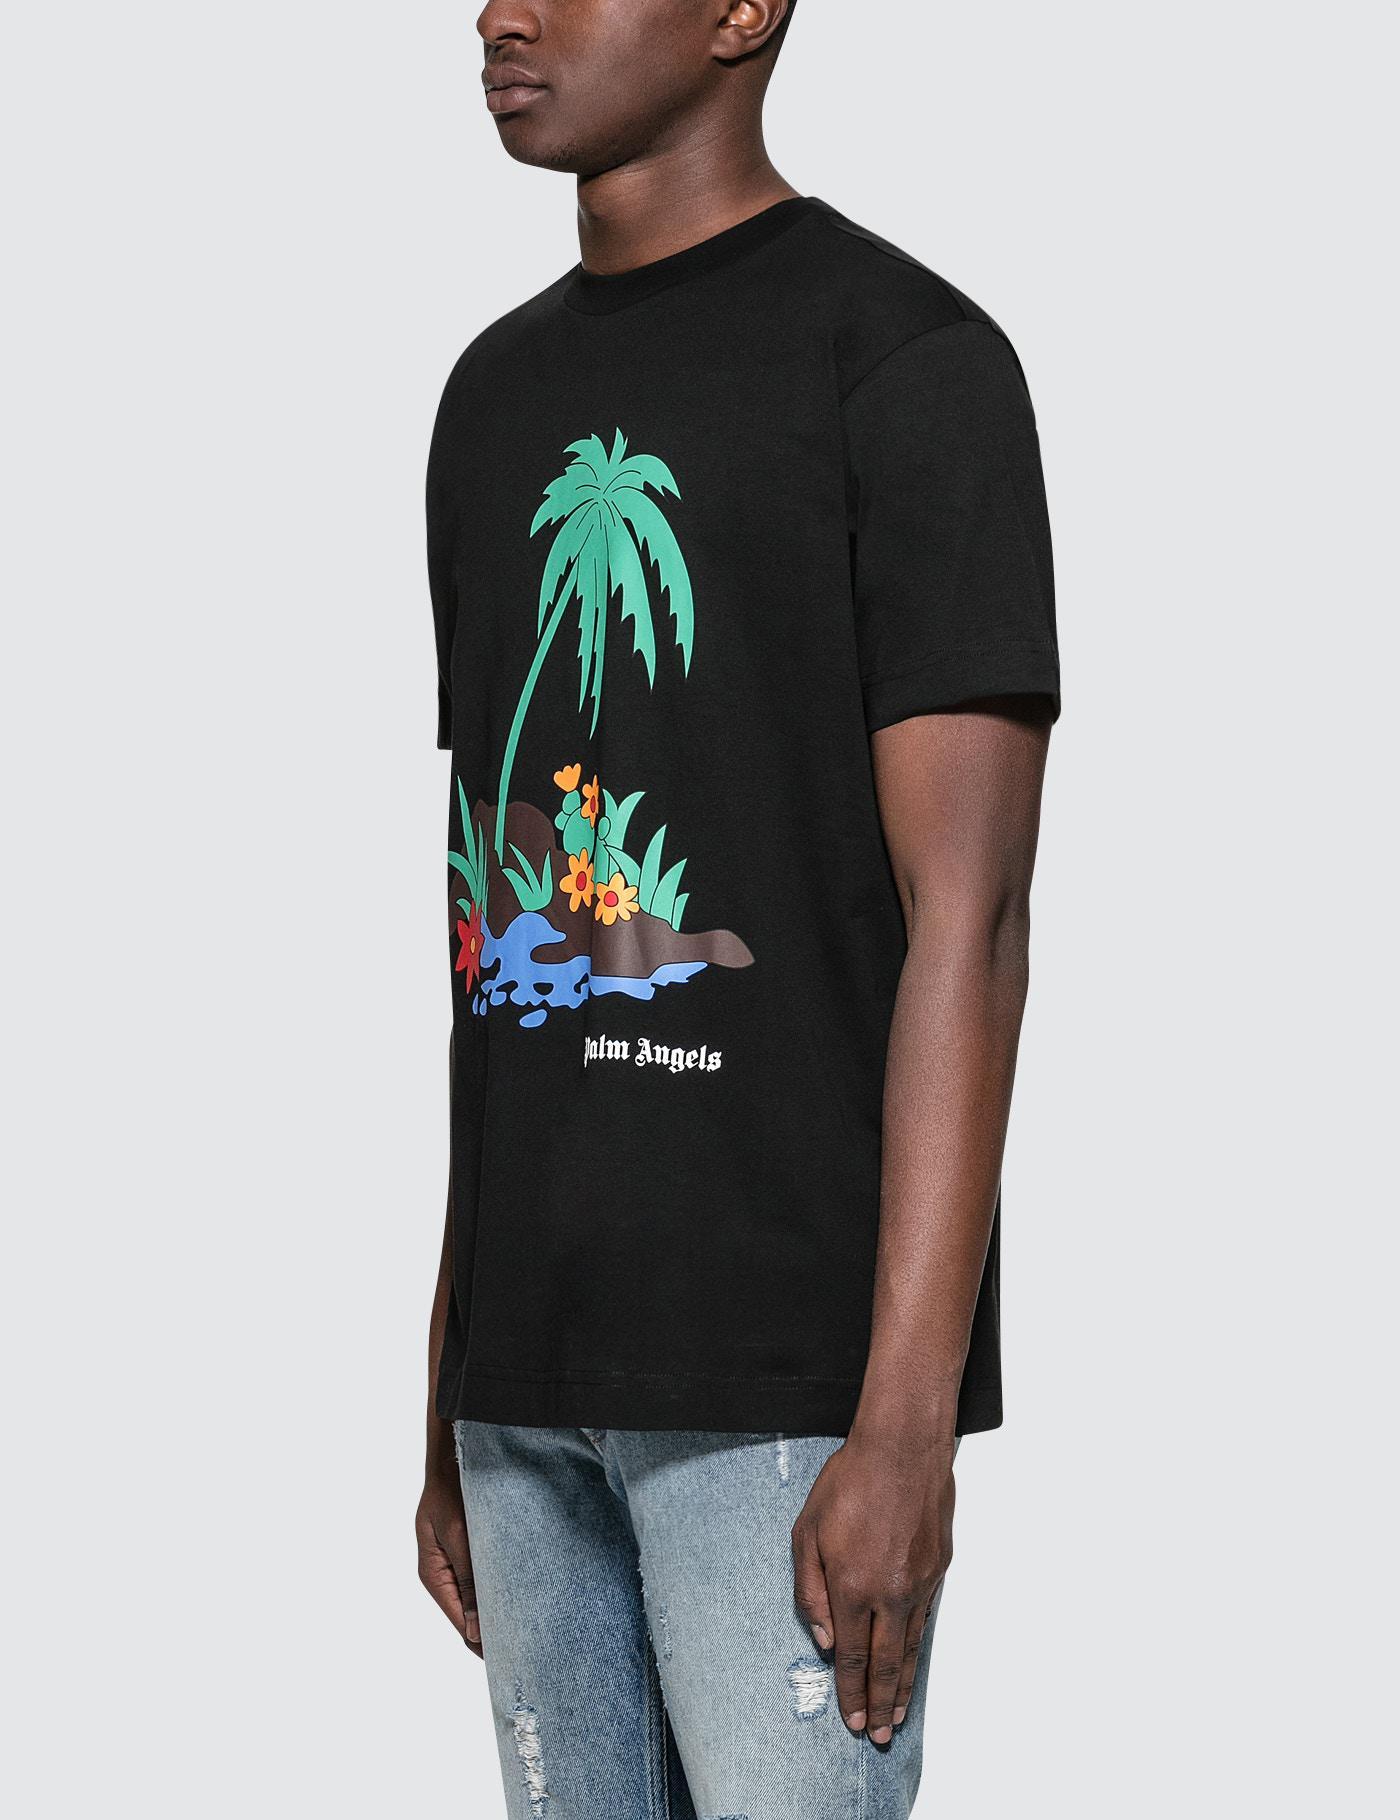 Palm Island T-shirt - Black Palm Angels Cheap Sale Perfect Outlet 100% Authentic Get Authentic Sale Online 8mPR3N